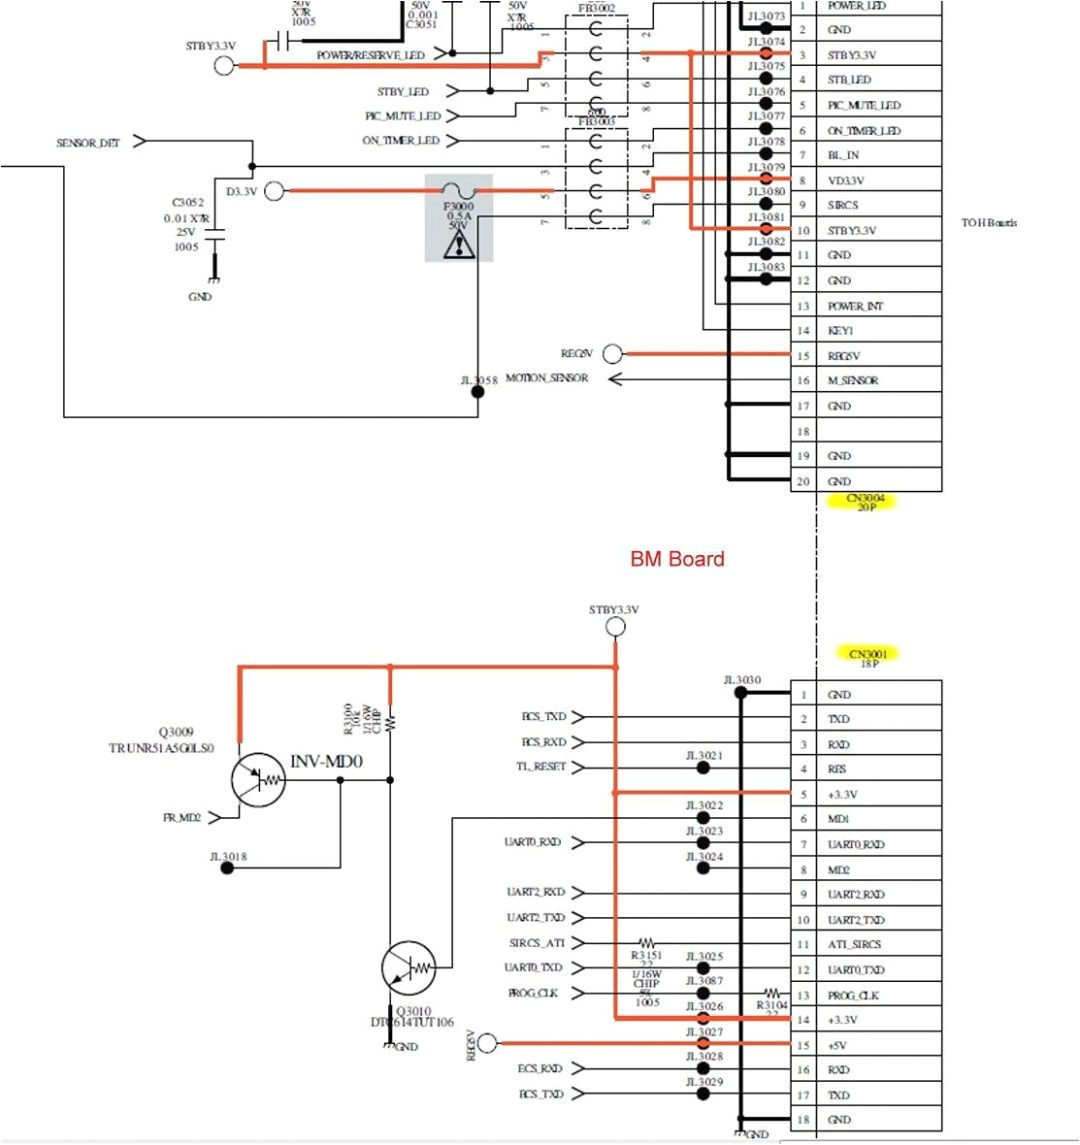 clarion cmd4 wiring diagram manual e bookcmd5 wiring diagram wiring diagram megacmd5 wiring diagram wiring diagram